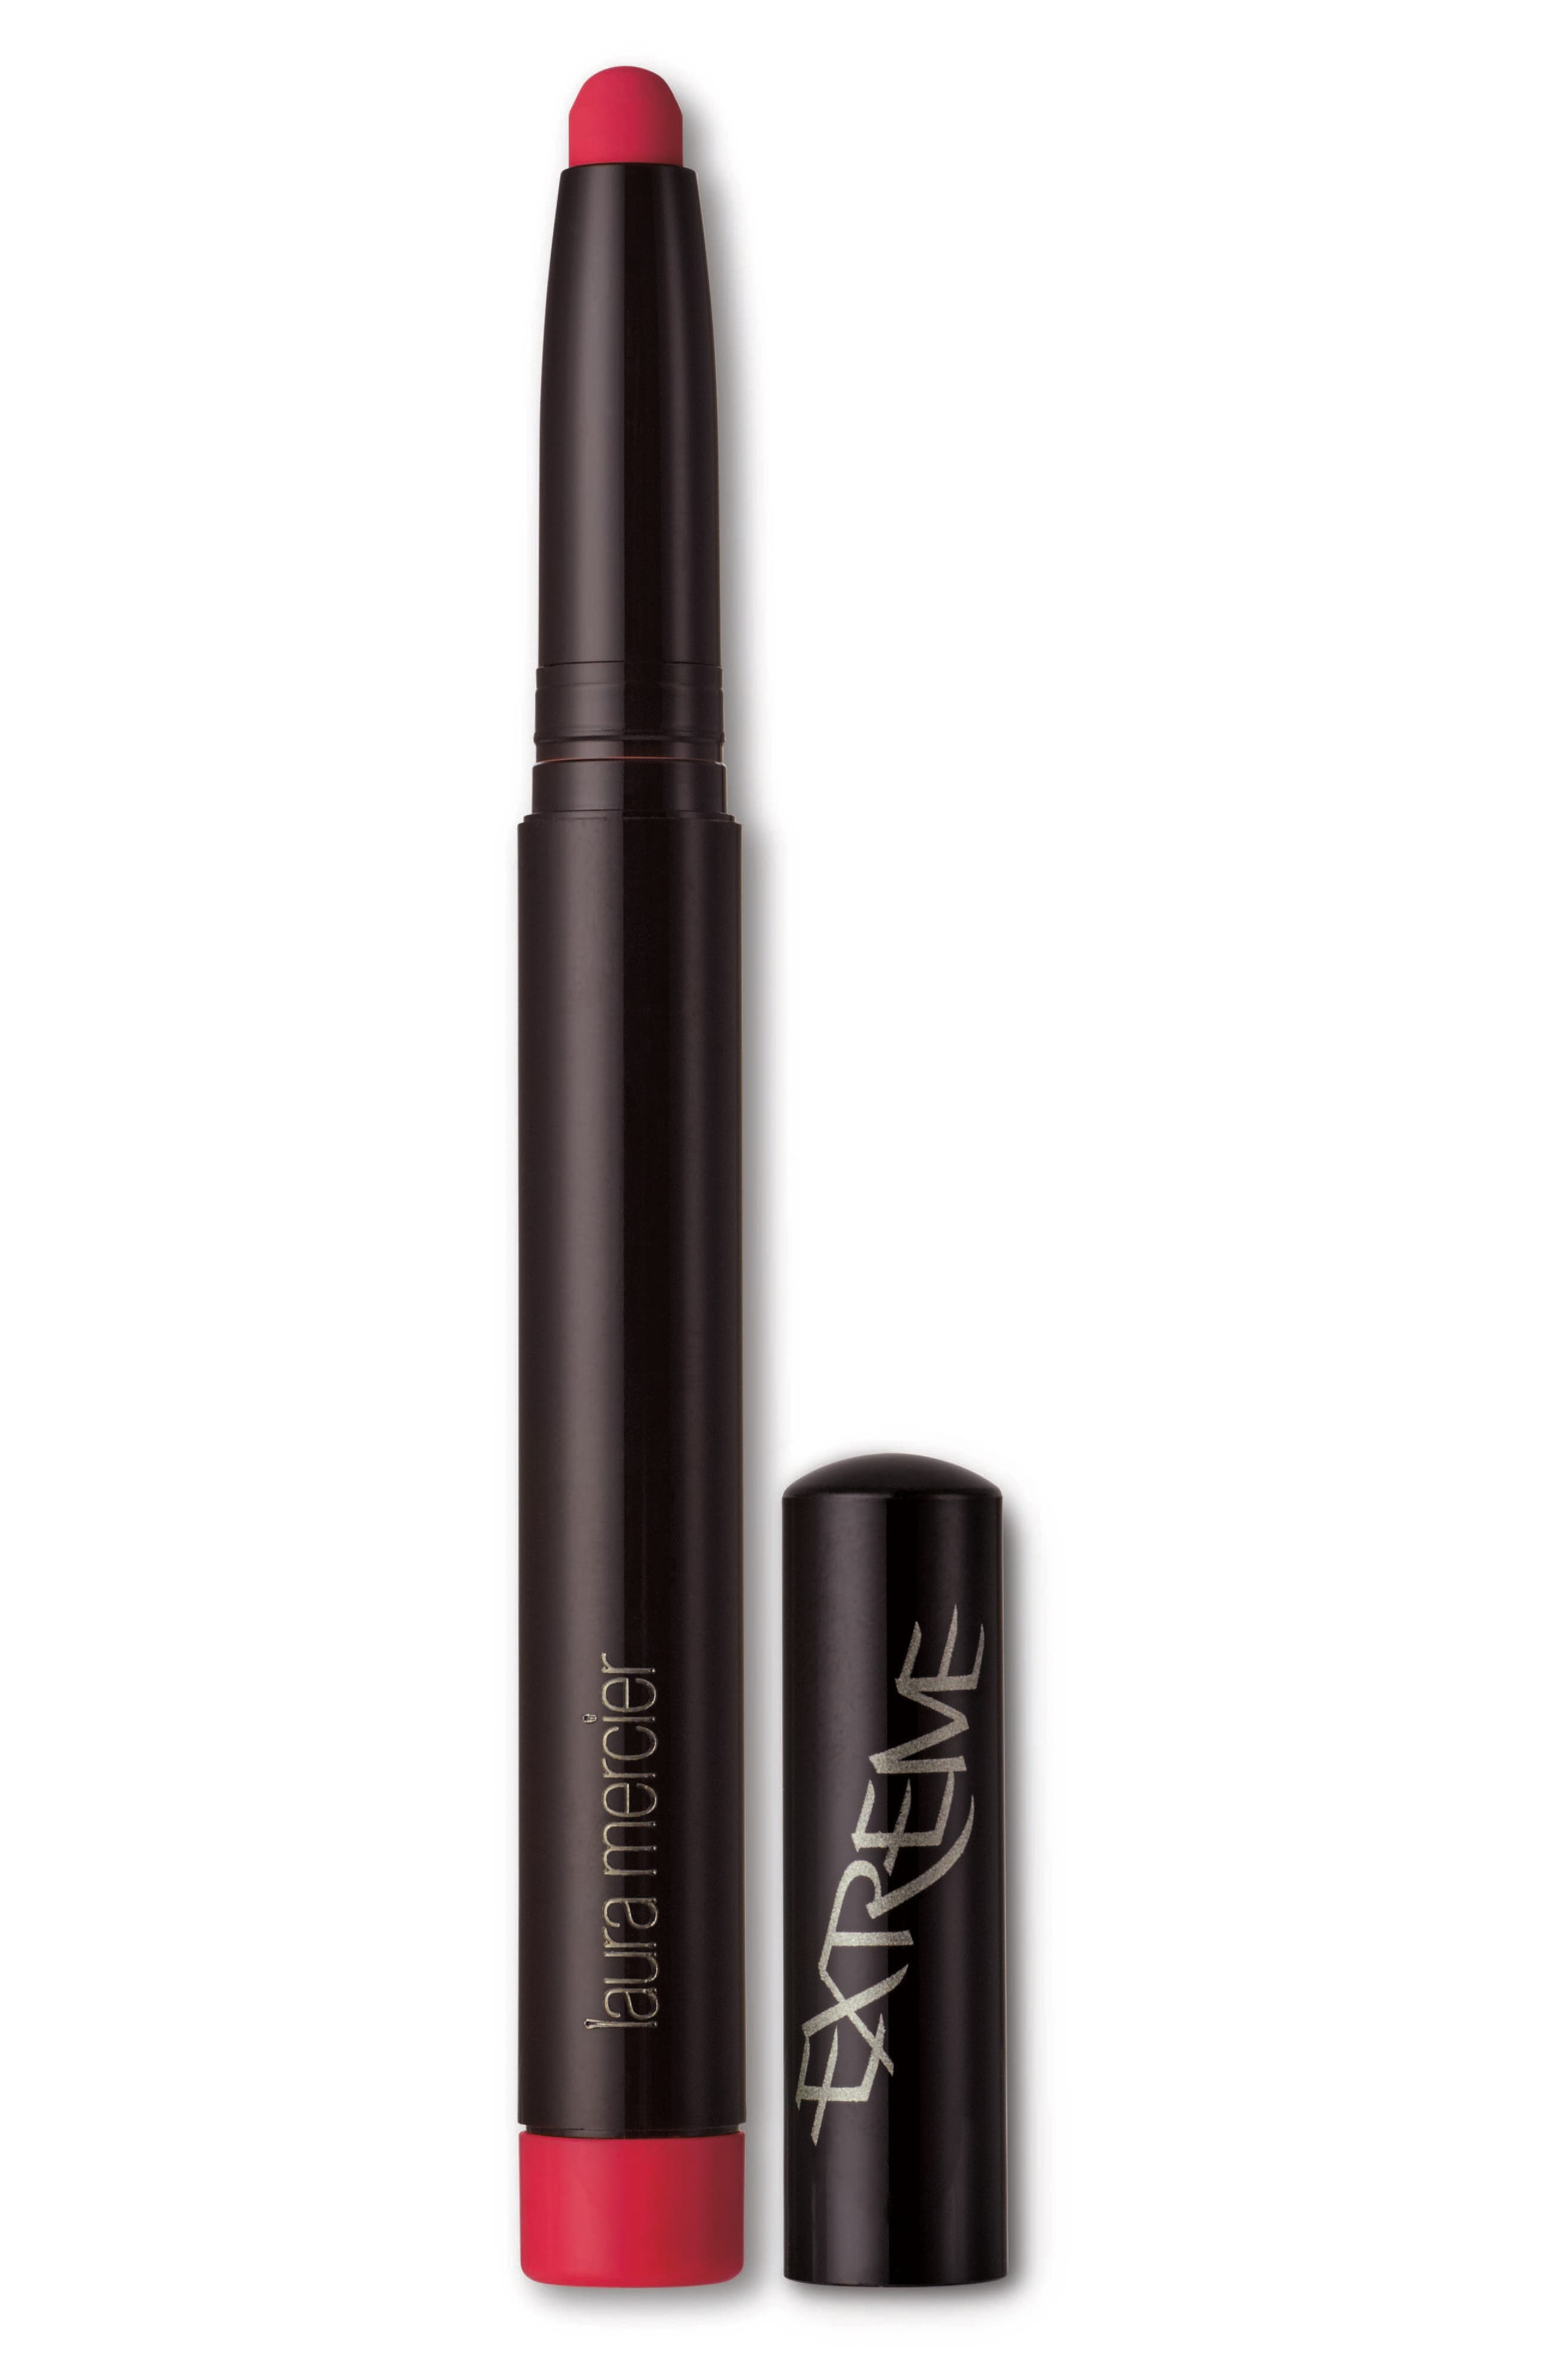 Alternate Image 1 Selected - Laura Mercier Velour Extreme Matte Lipstick